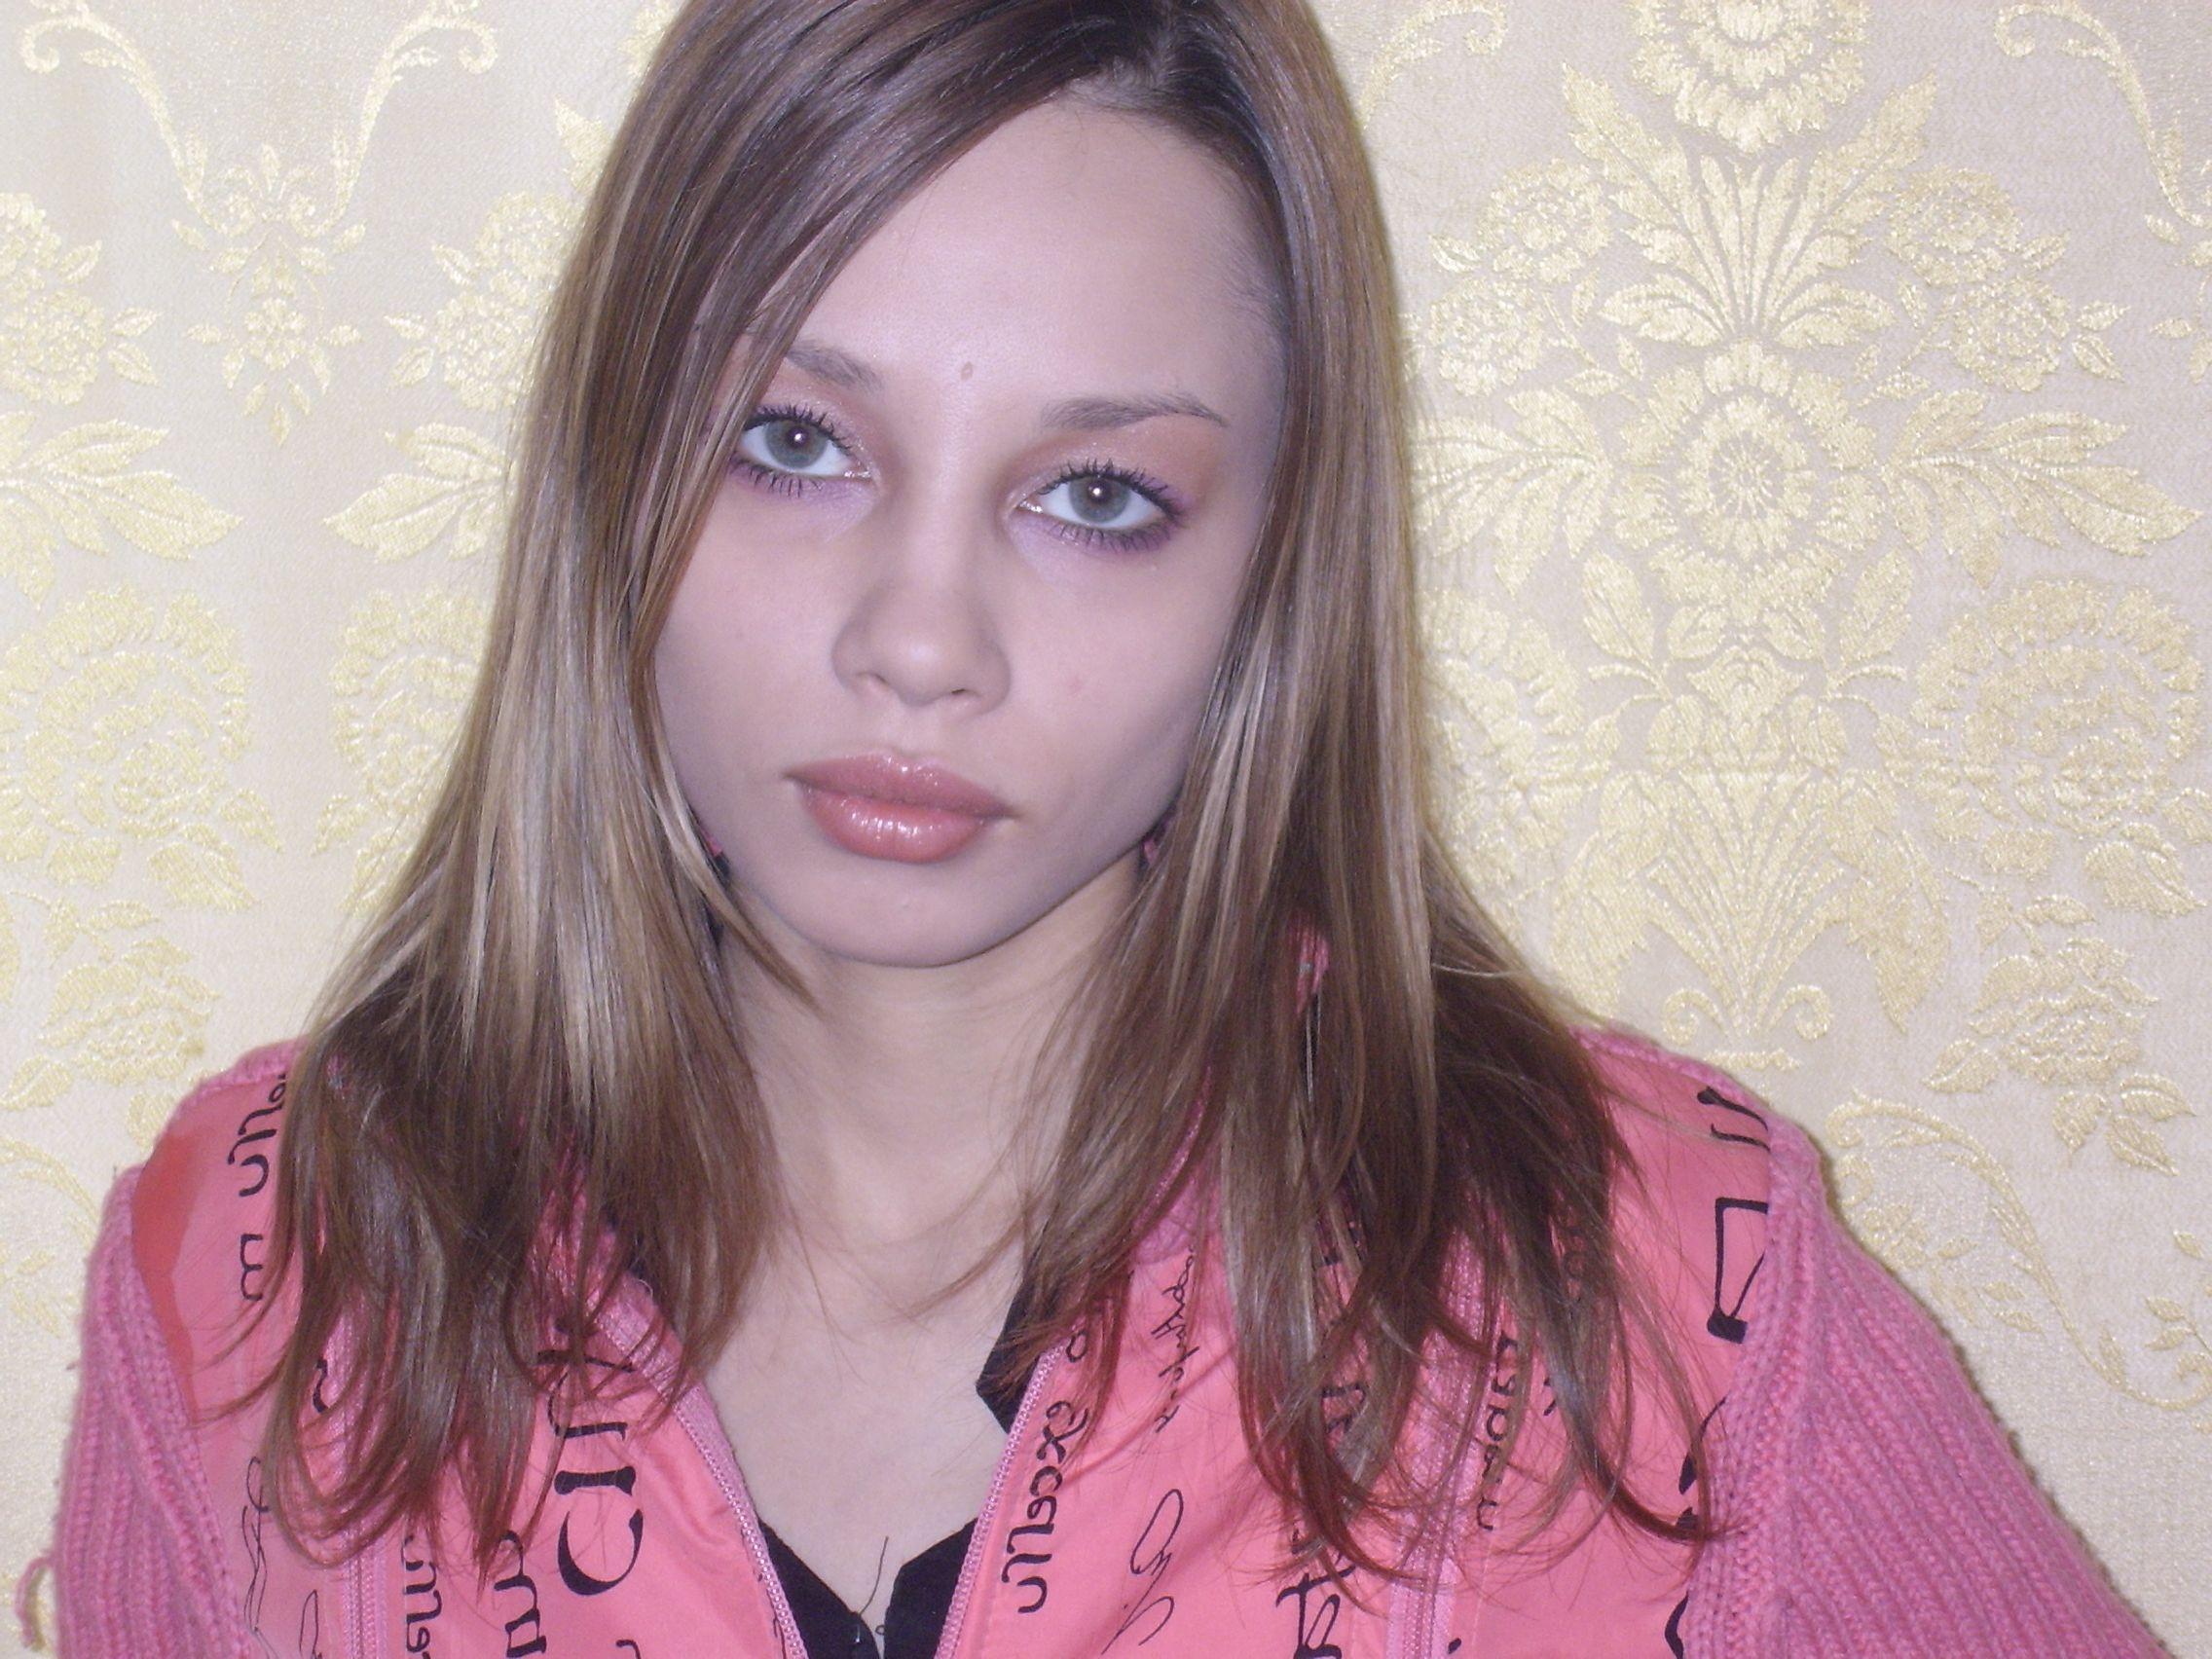 Фото из контакта девушки 7 фотография